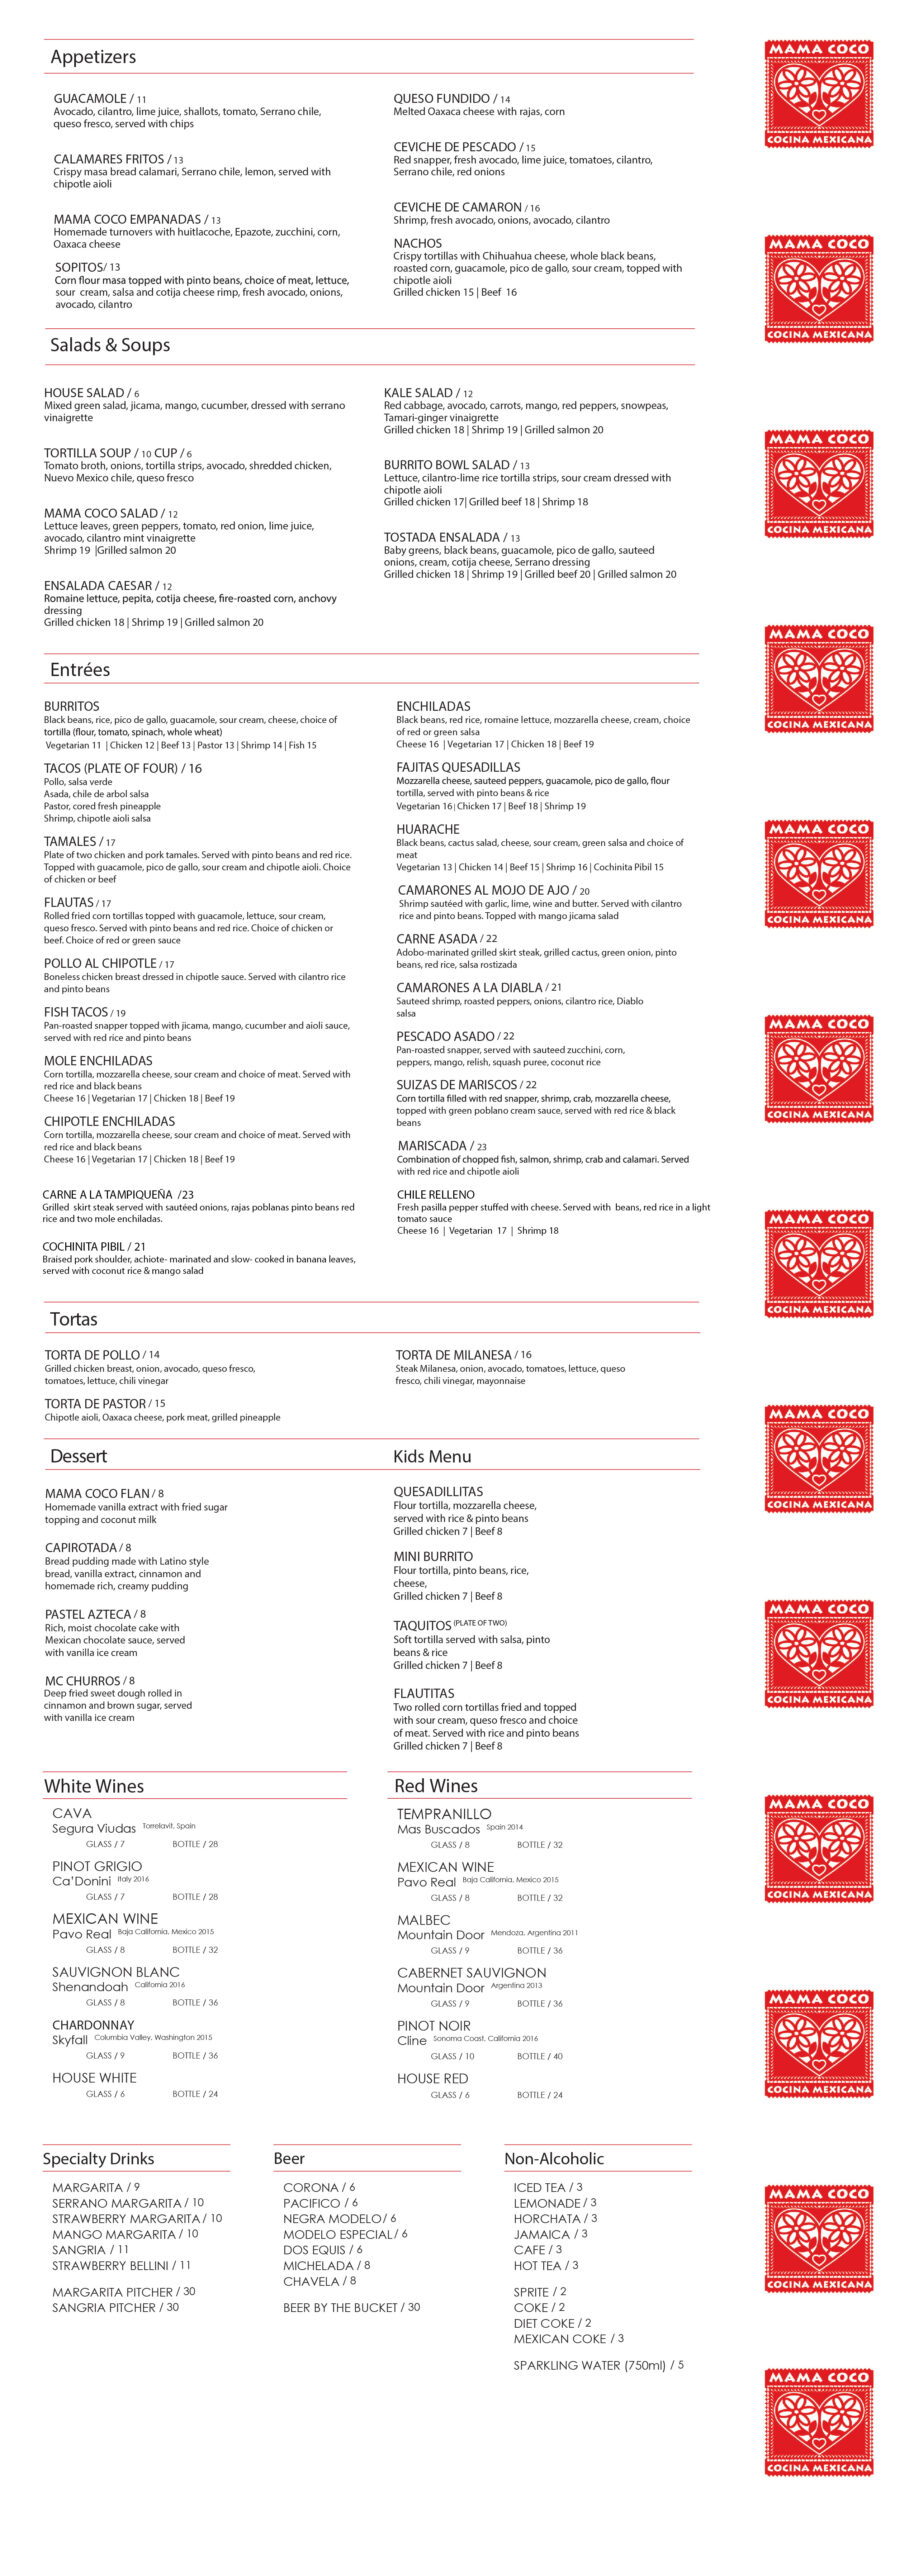 Mama-Coco-menu-12.1.2020